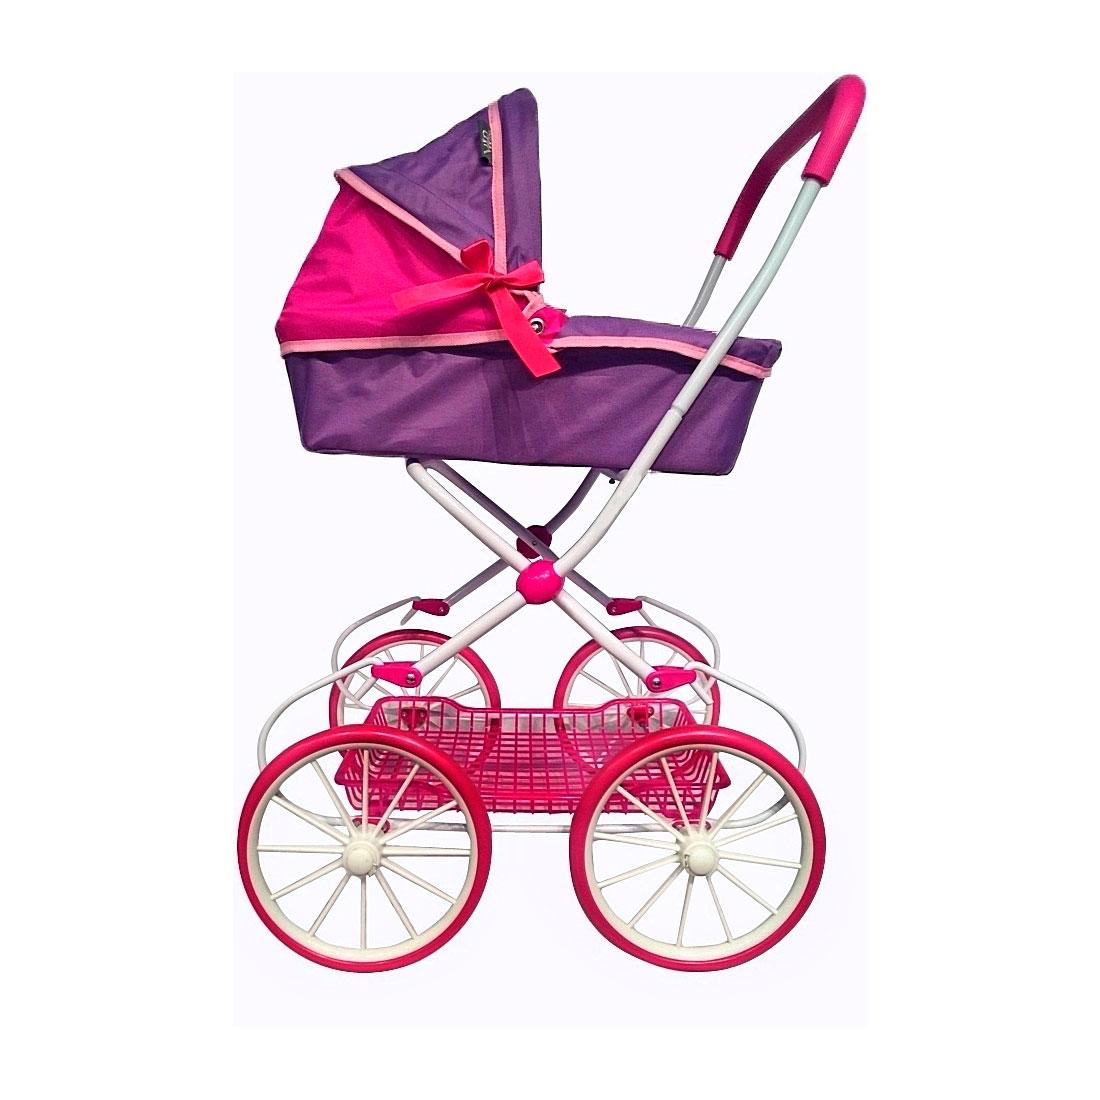 Кукольная коляска RT 603 Фиолетовый и фуксия<br>